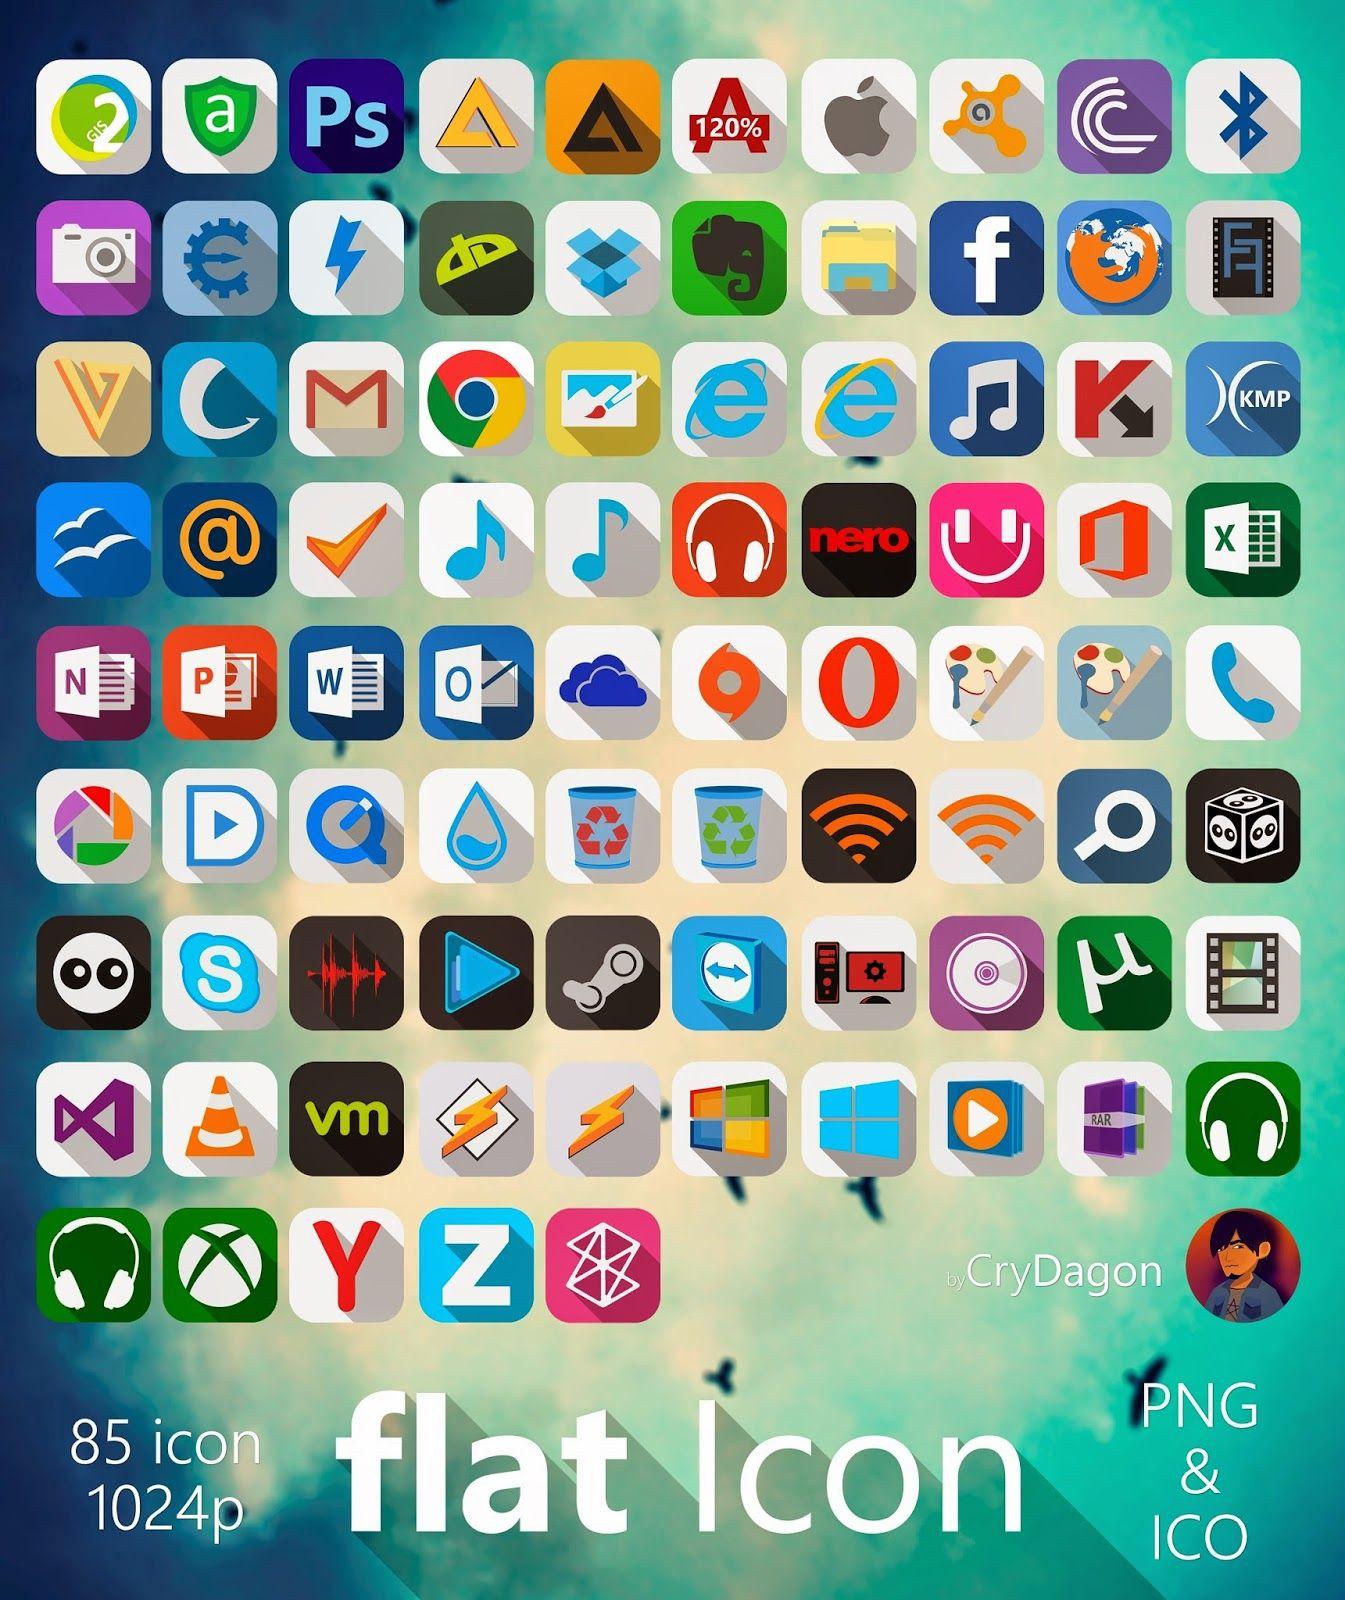 Windows 7 Files That Contain Icons Windows, Custom icons